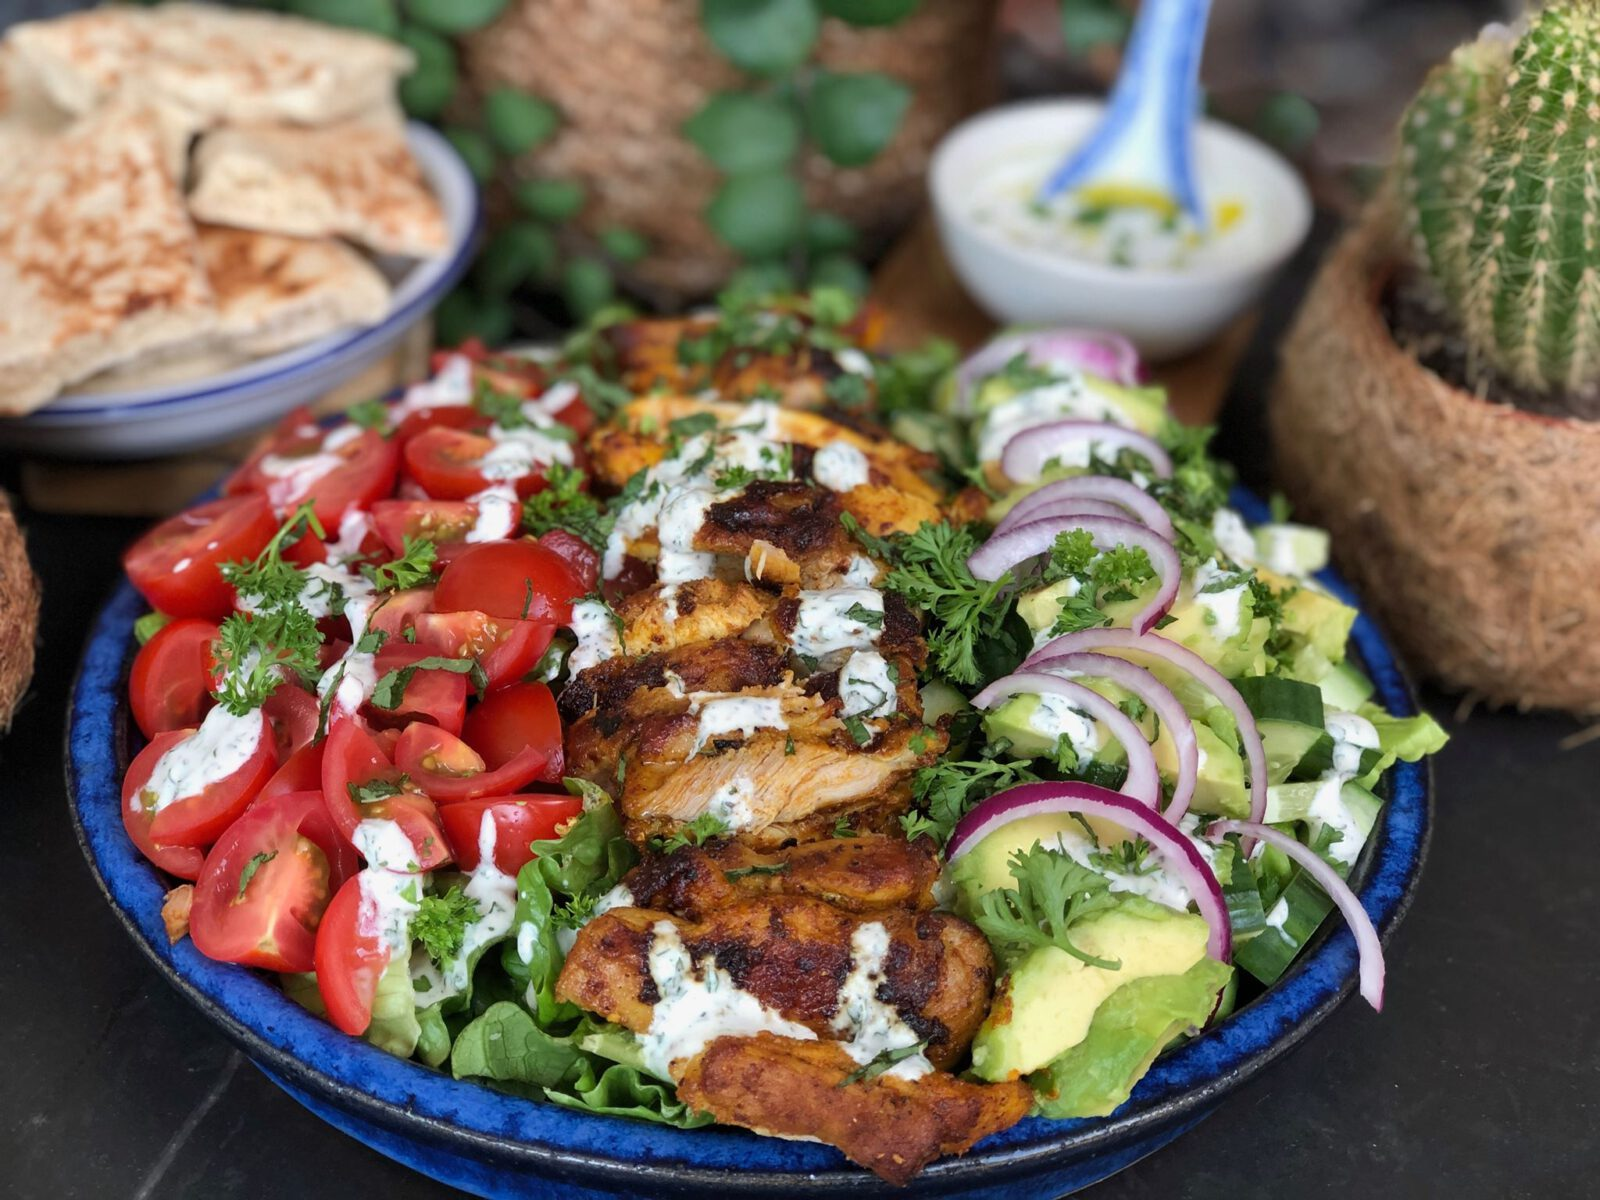 salade met kip shoarma en kruidige dressing